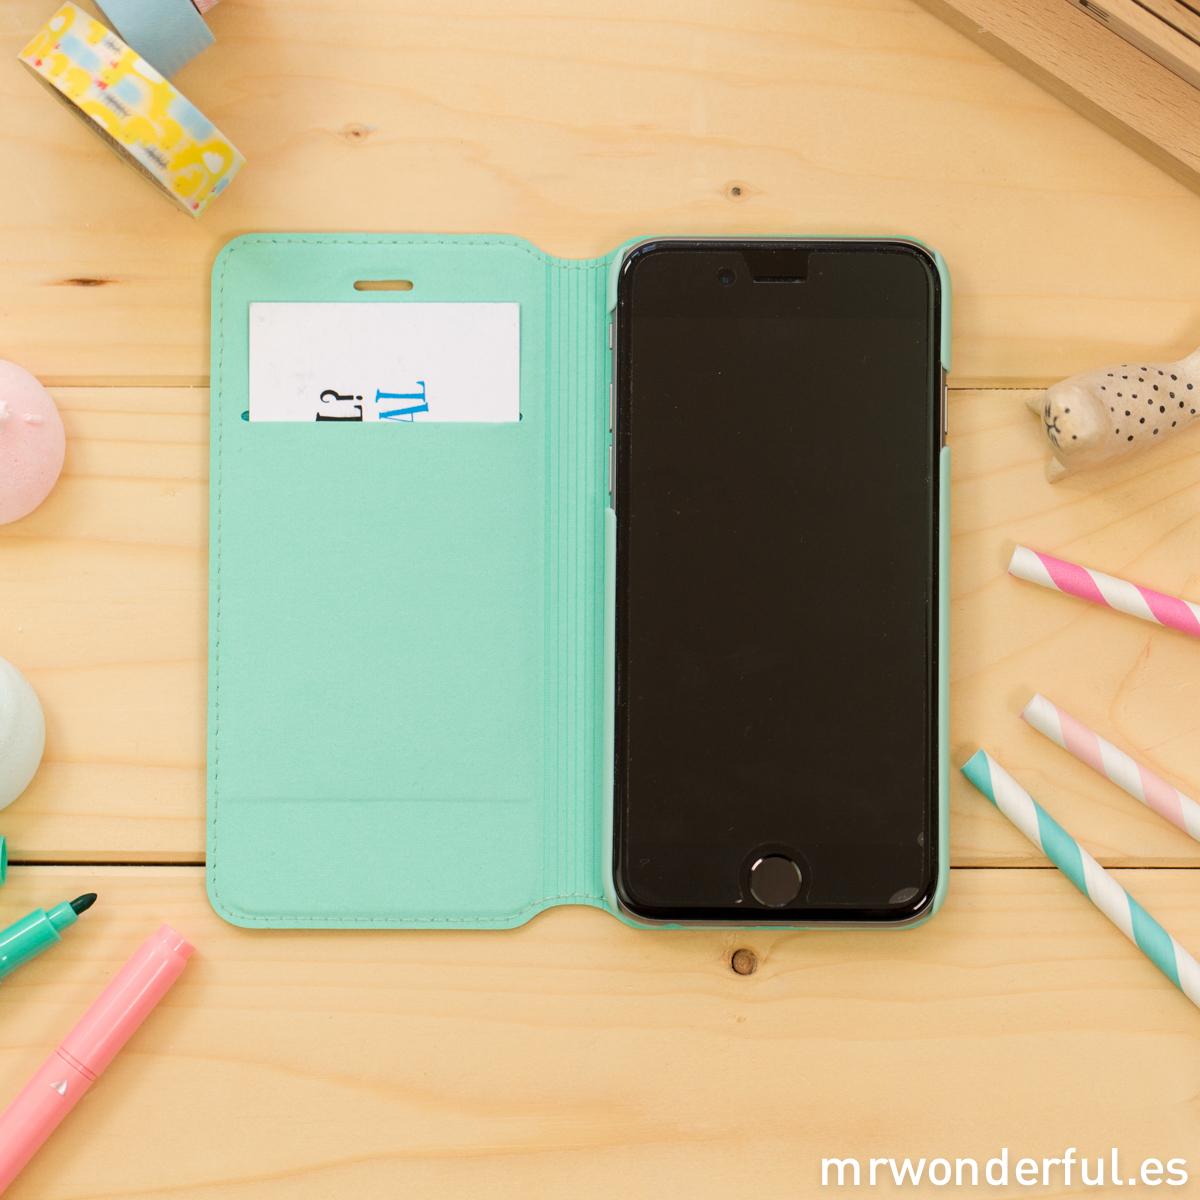 mrwonderful_8436557680150_MRFOL011_funda-libro-iphone-6-momentos-MrW-17